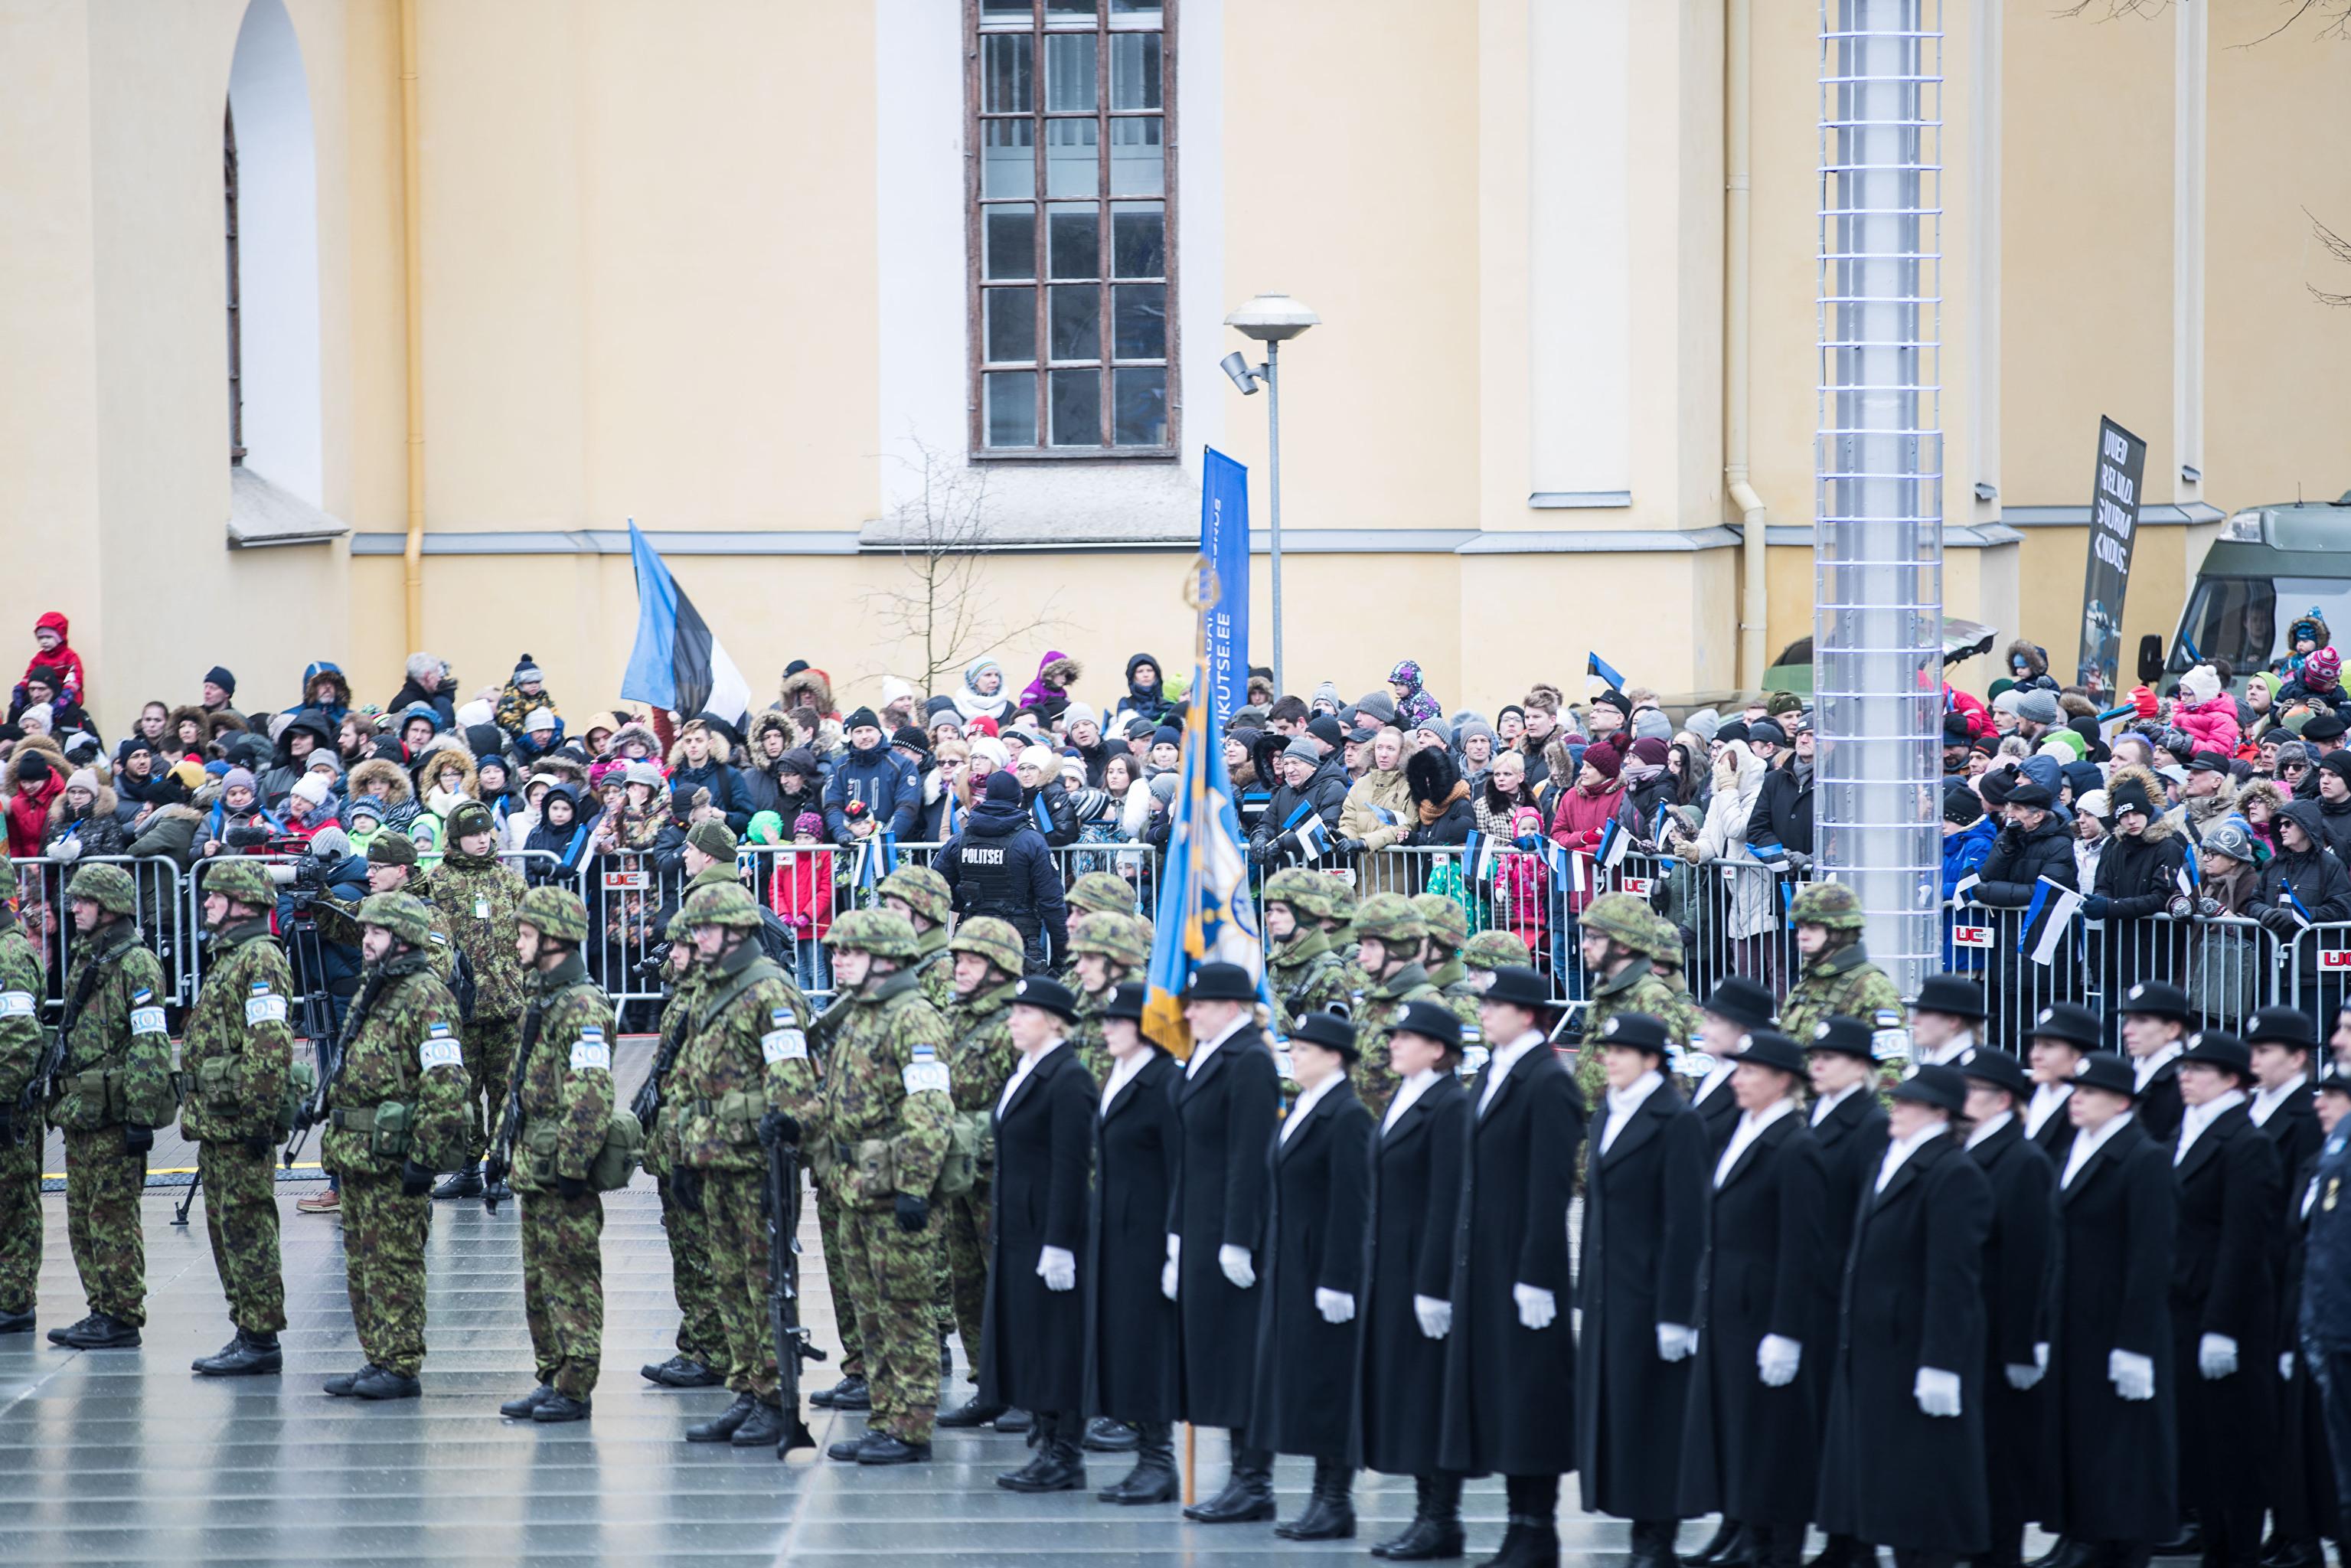 опыт оперативного ввс латвии на параде фото автомобили